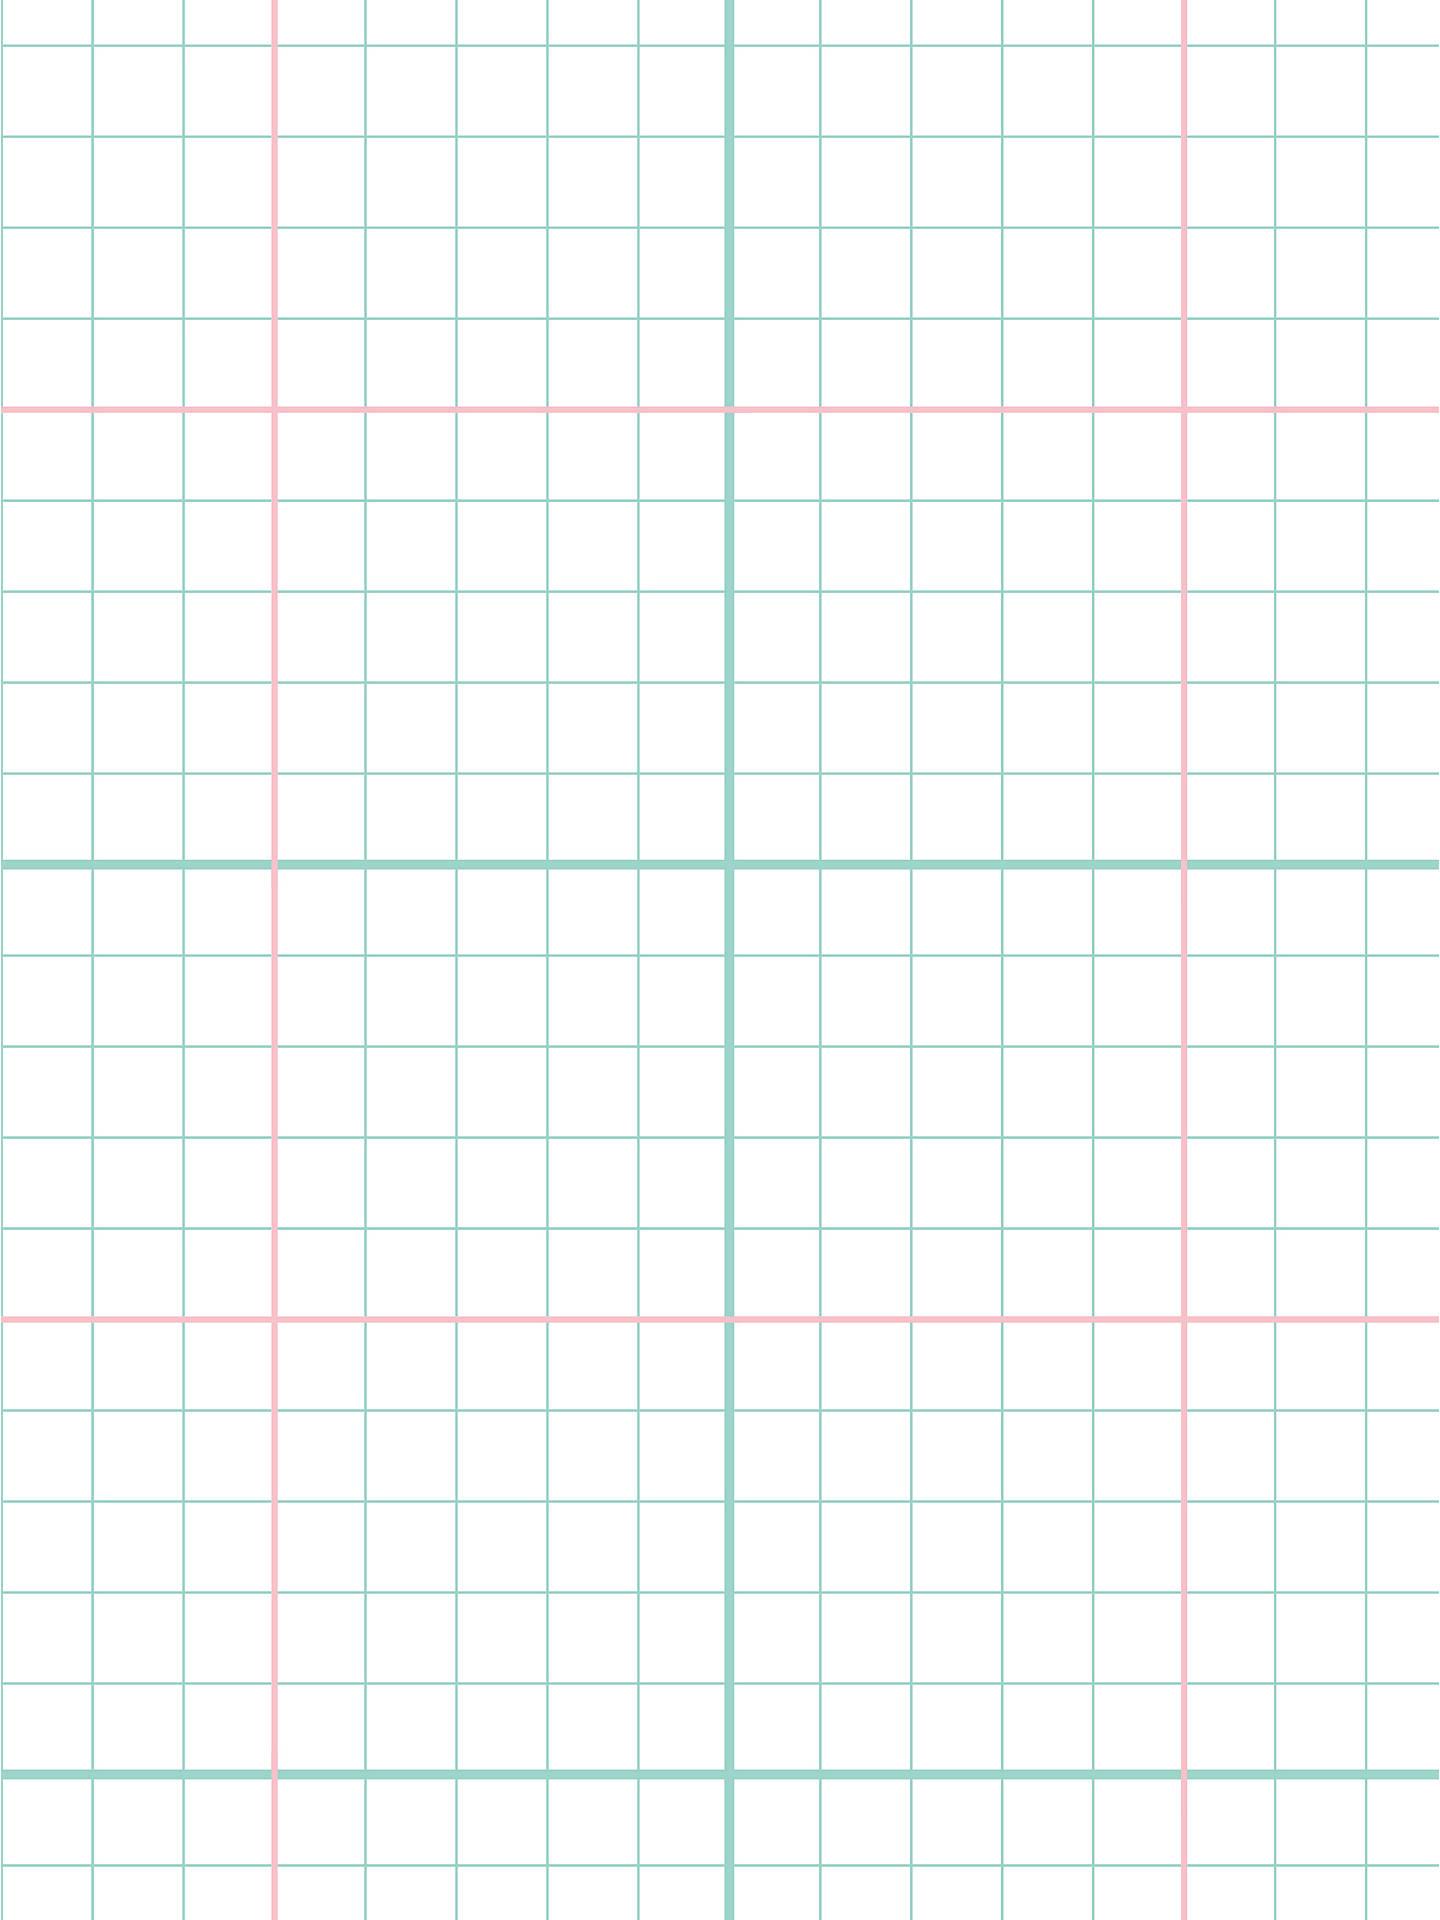 mini moderns homework